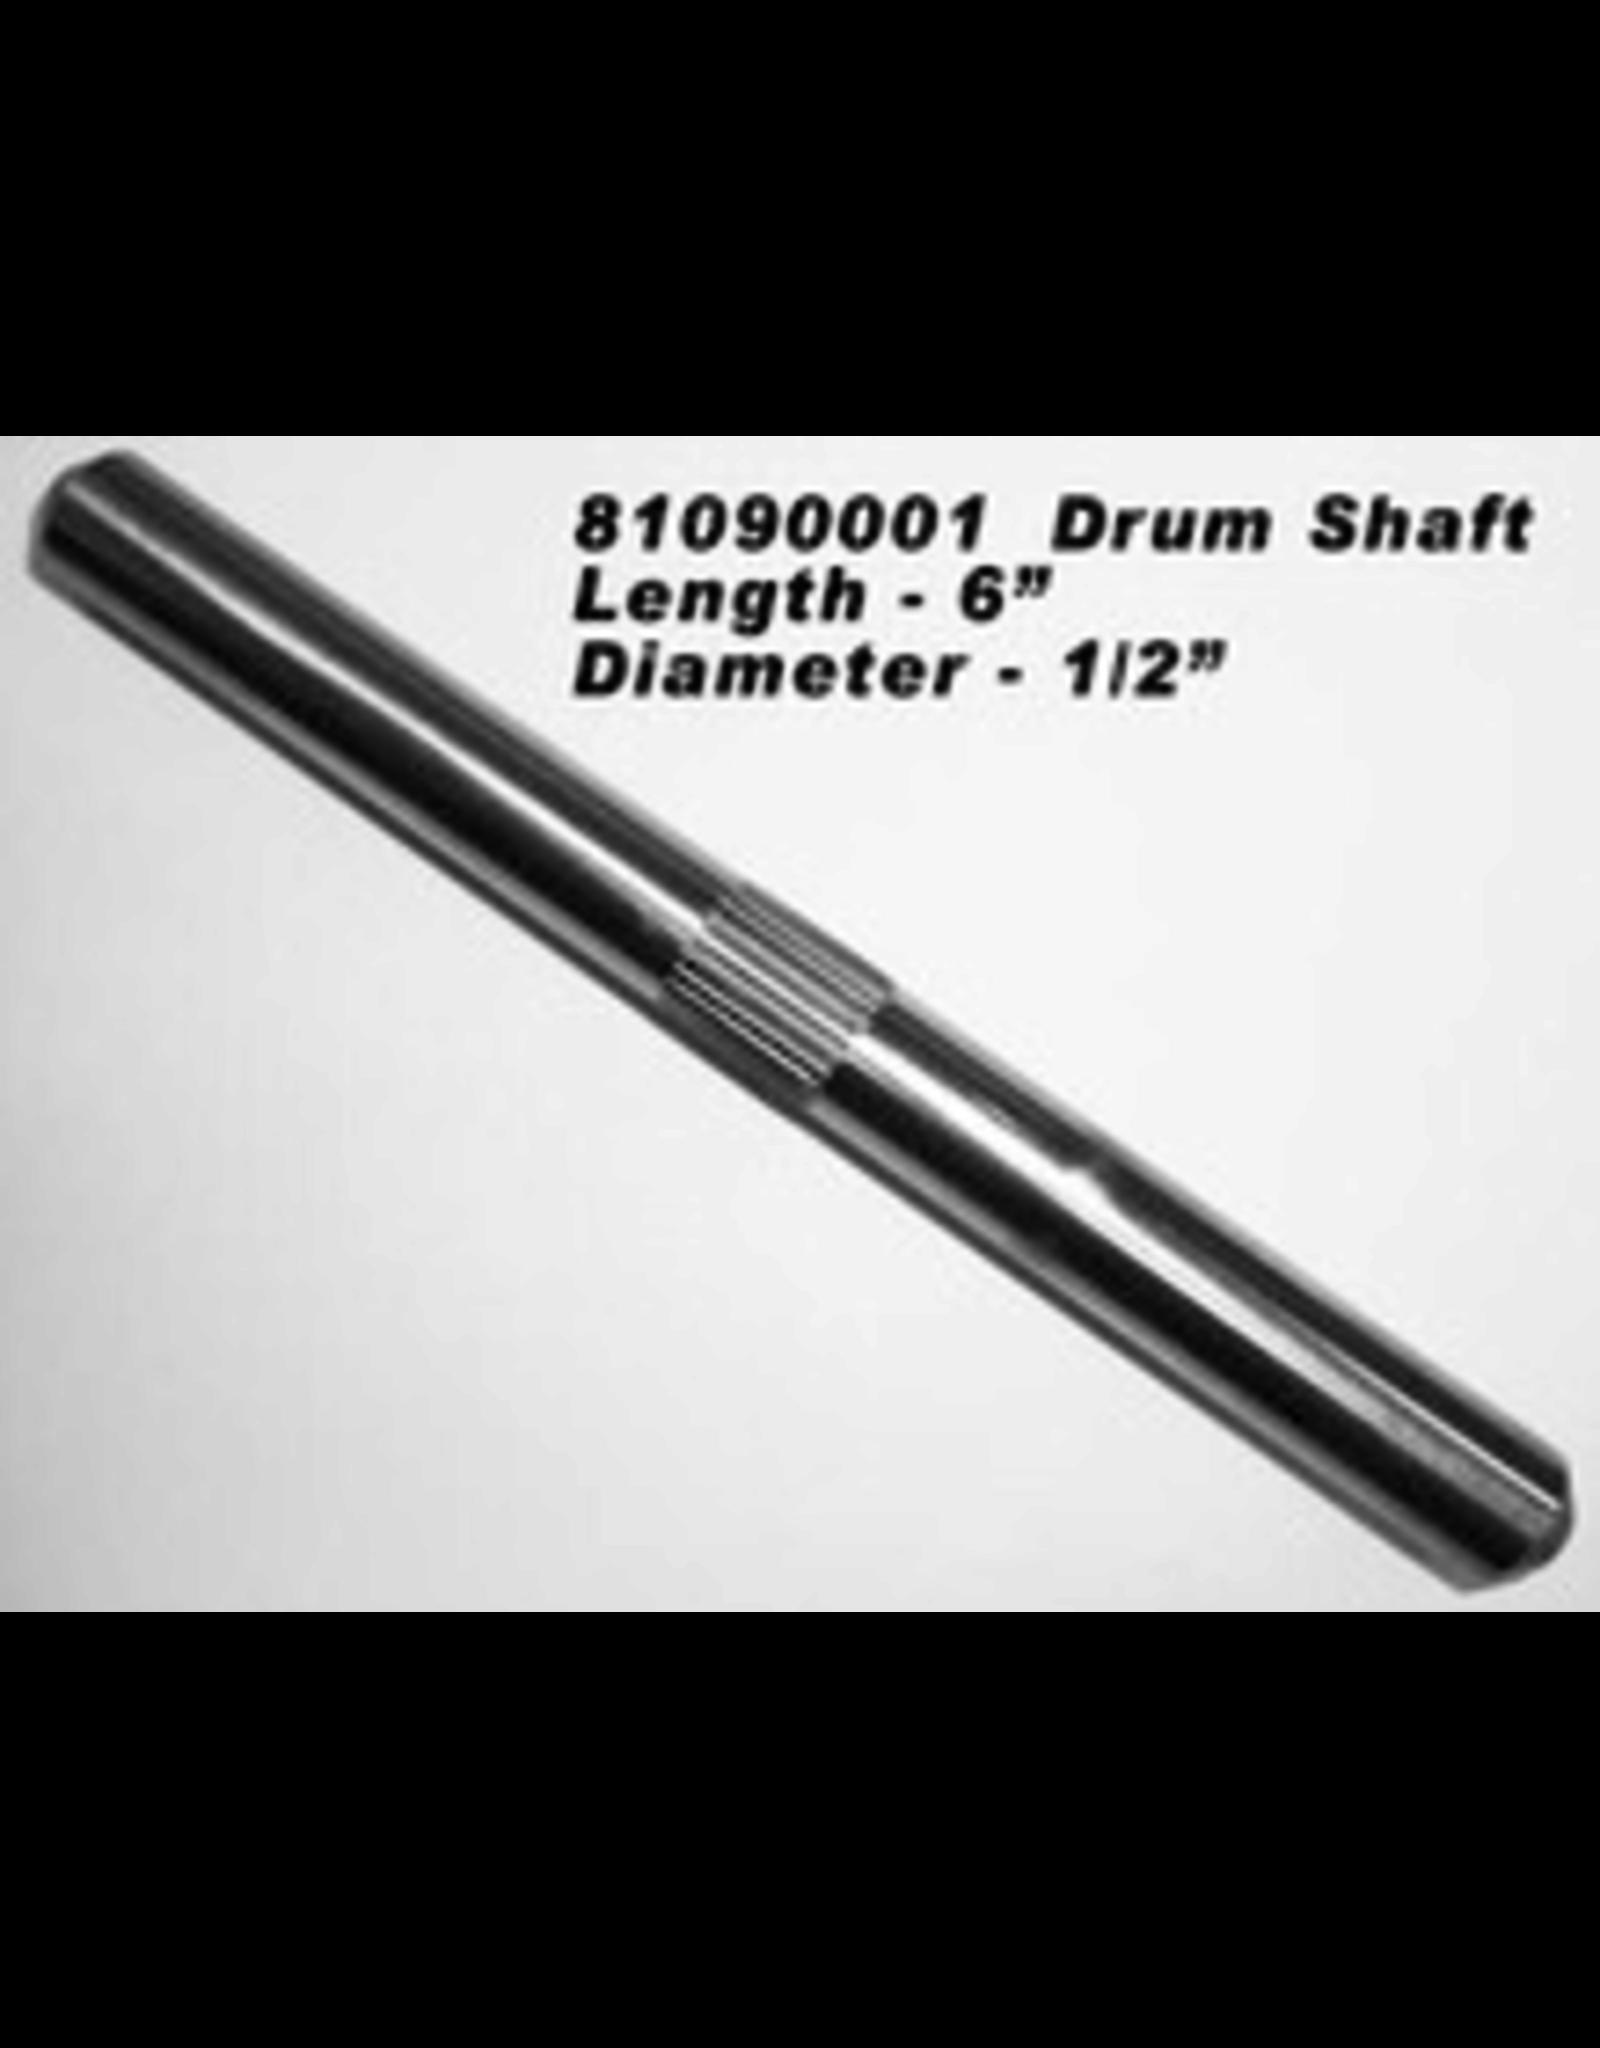 Hobie Hobie MirageDrive Drum Shaft, X-39